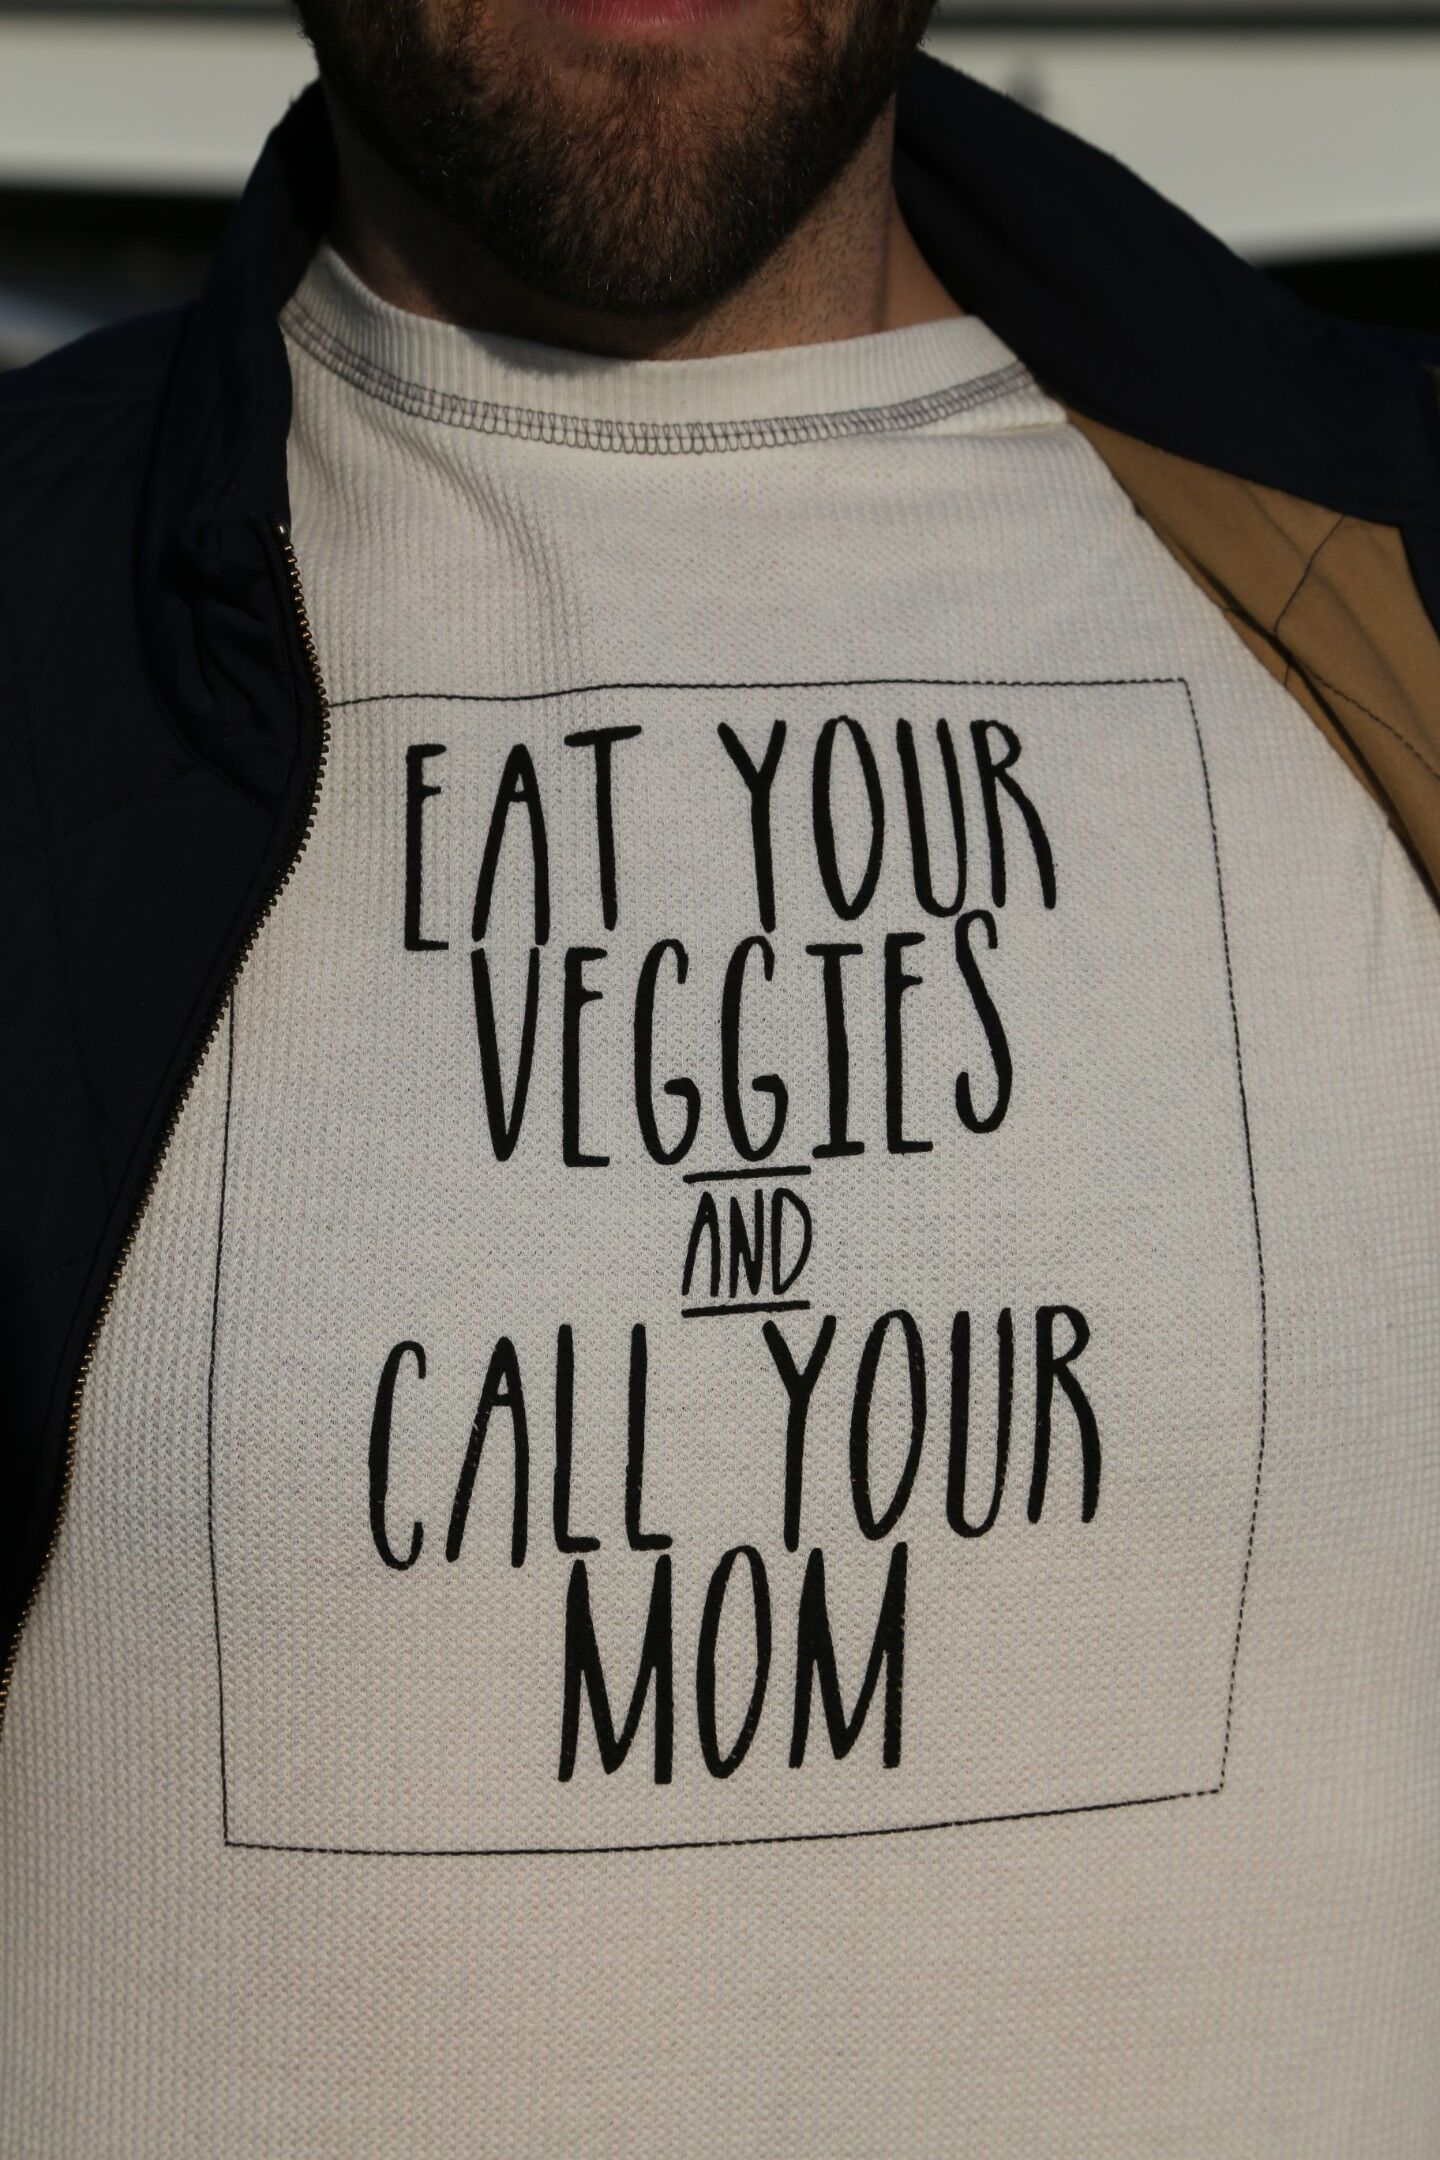 Photo by Bivens Photography. Shirt printed at    Fresh Lab Cleveland   .